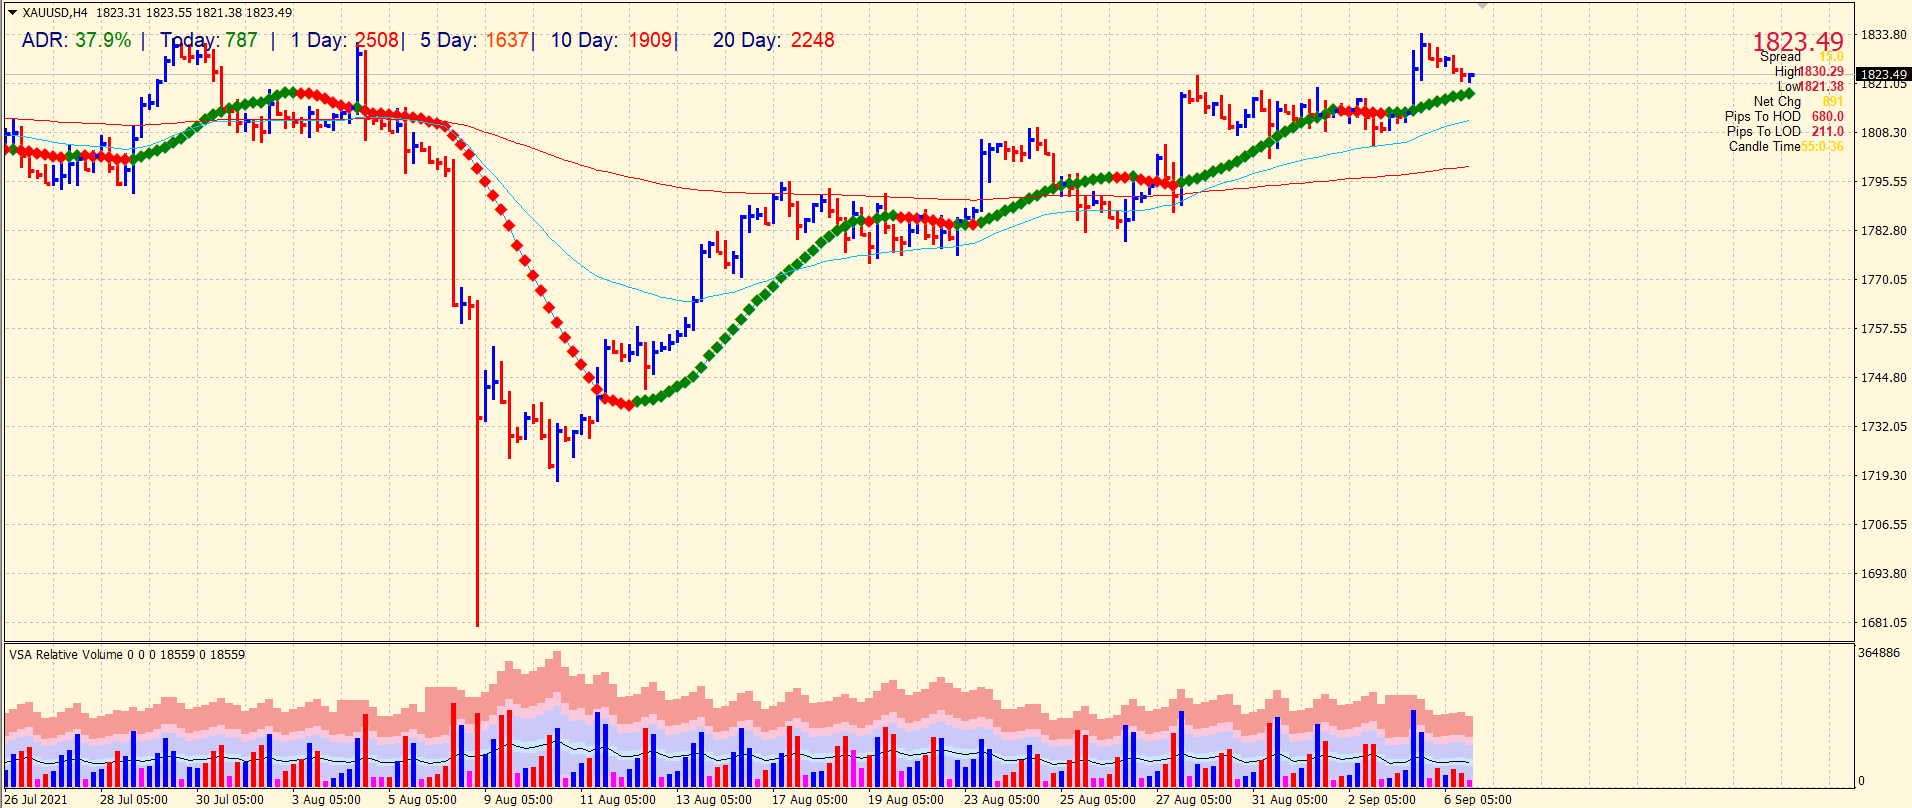 Gold 4-hour price forecast